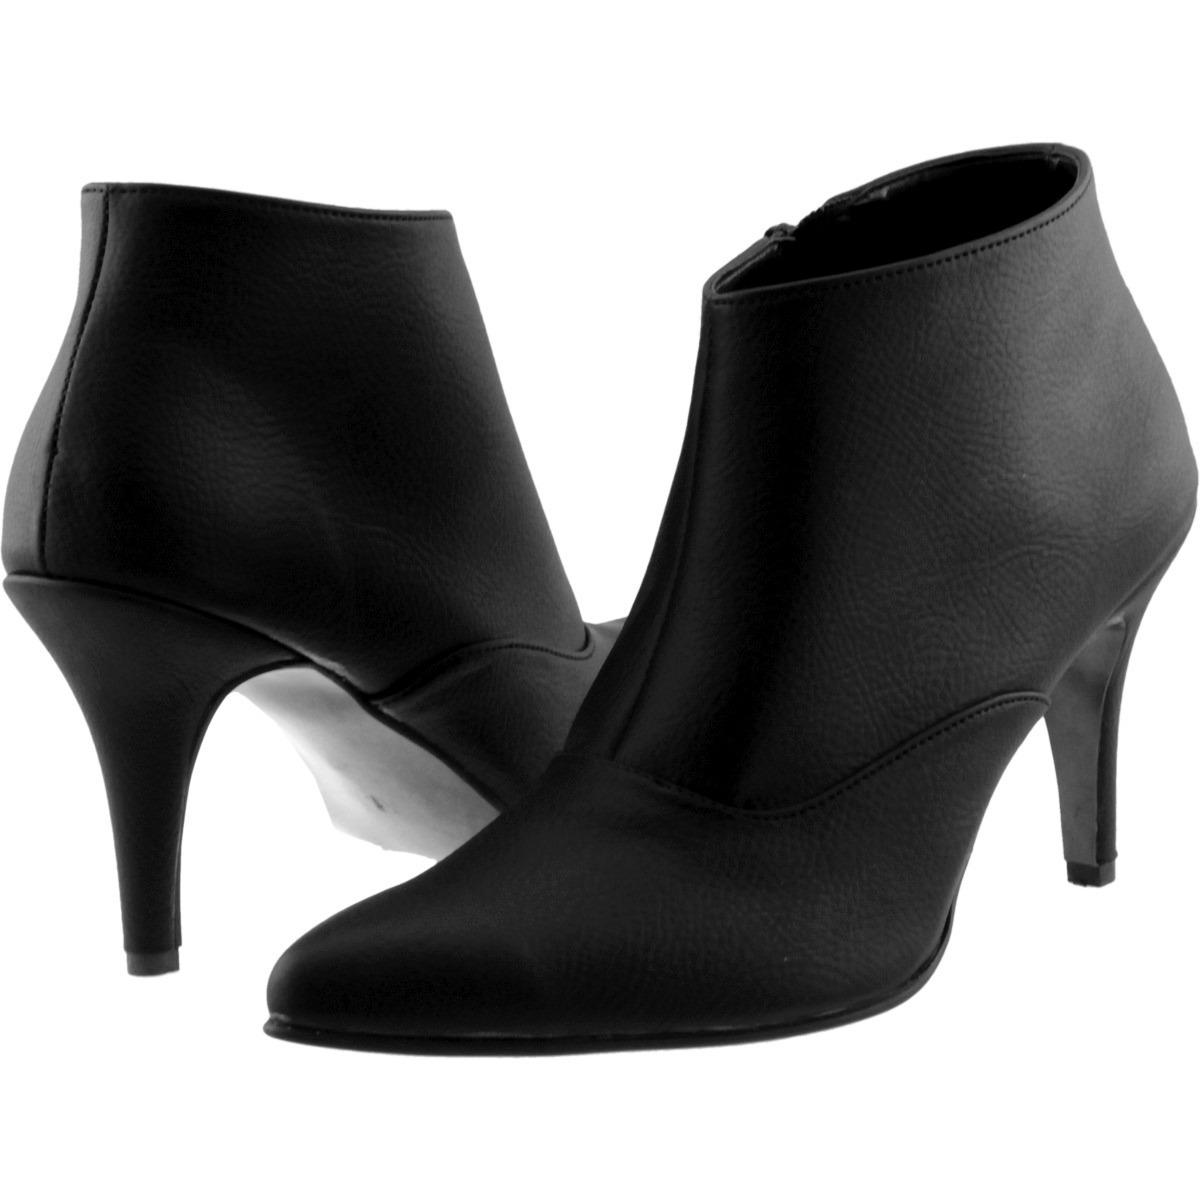 6872c2ce5f4 zapatos de vestir para dama